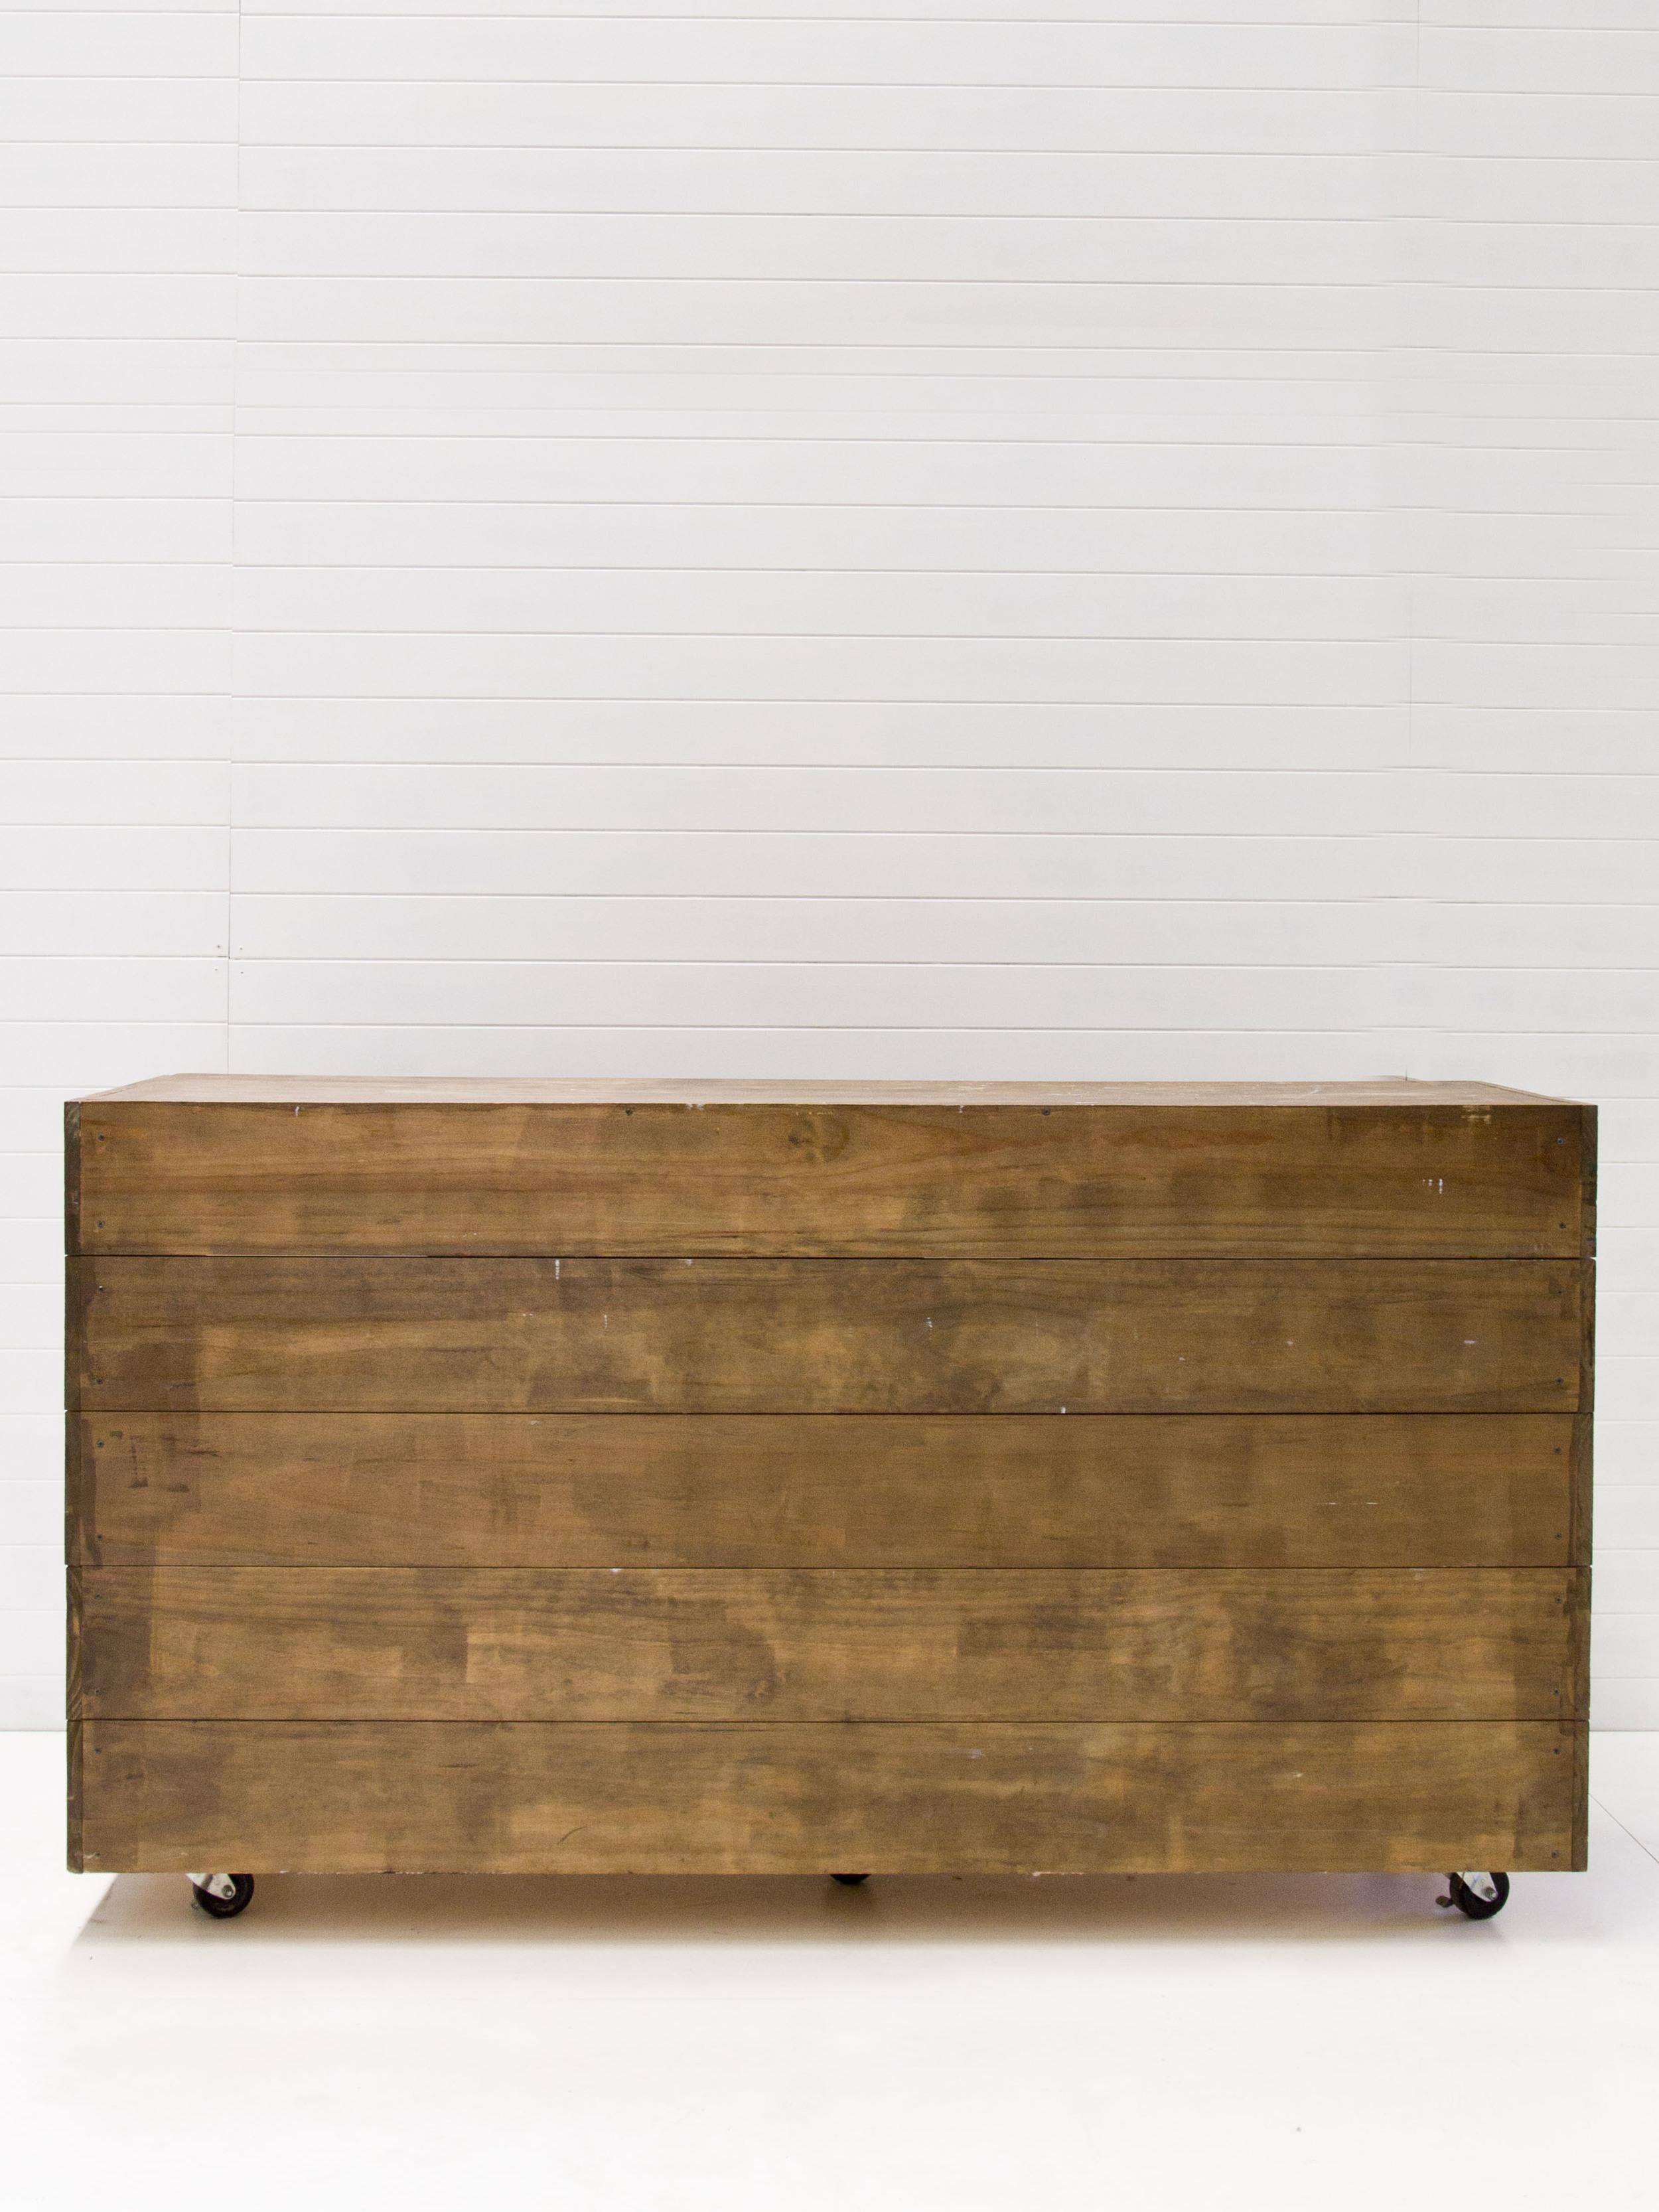 Rustic wooden bar.jpg